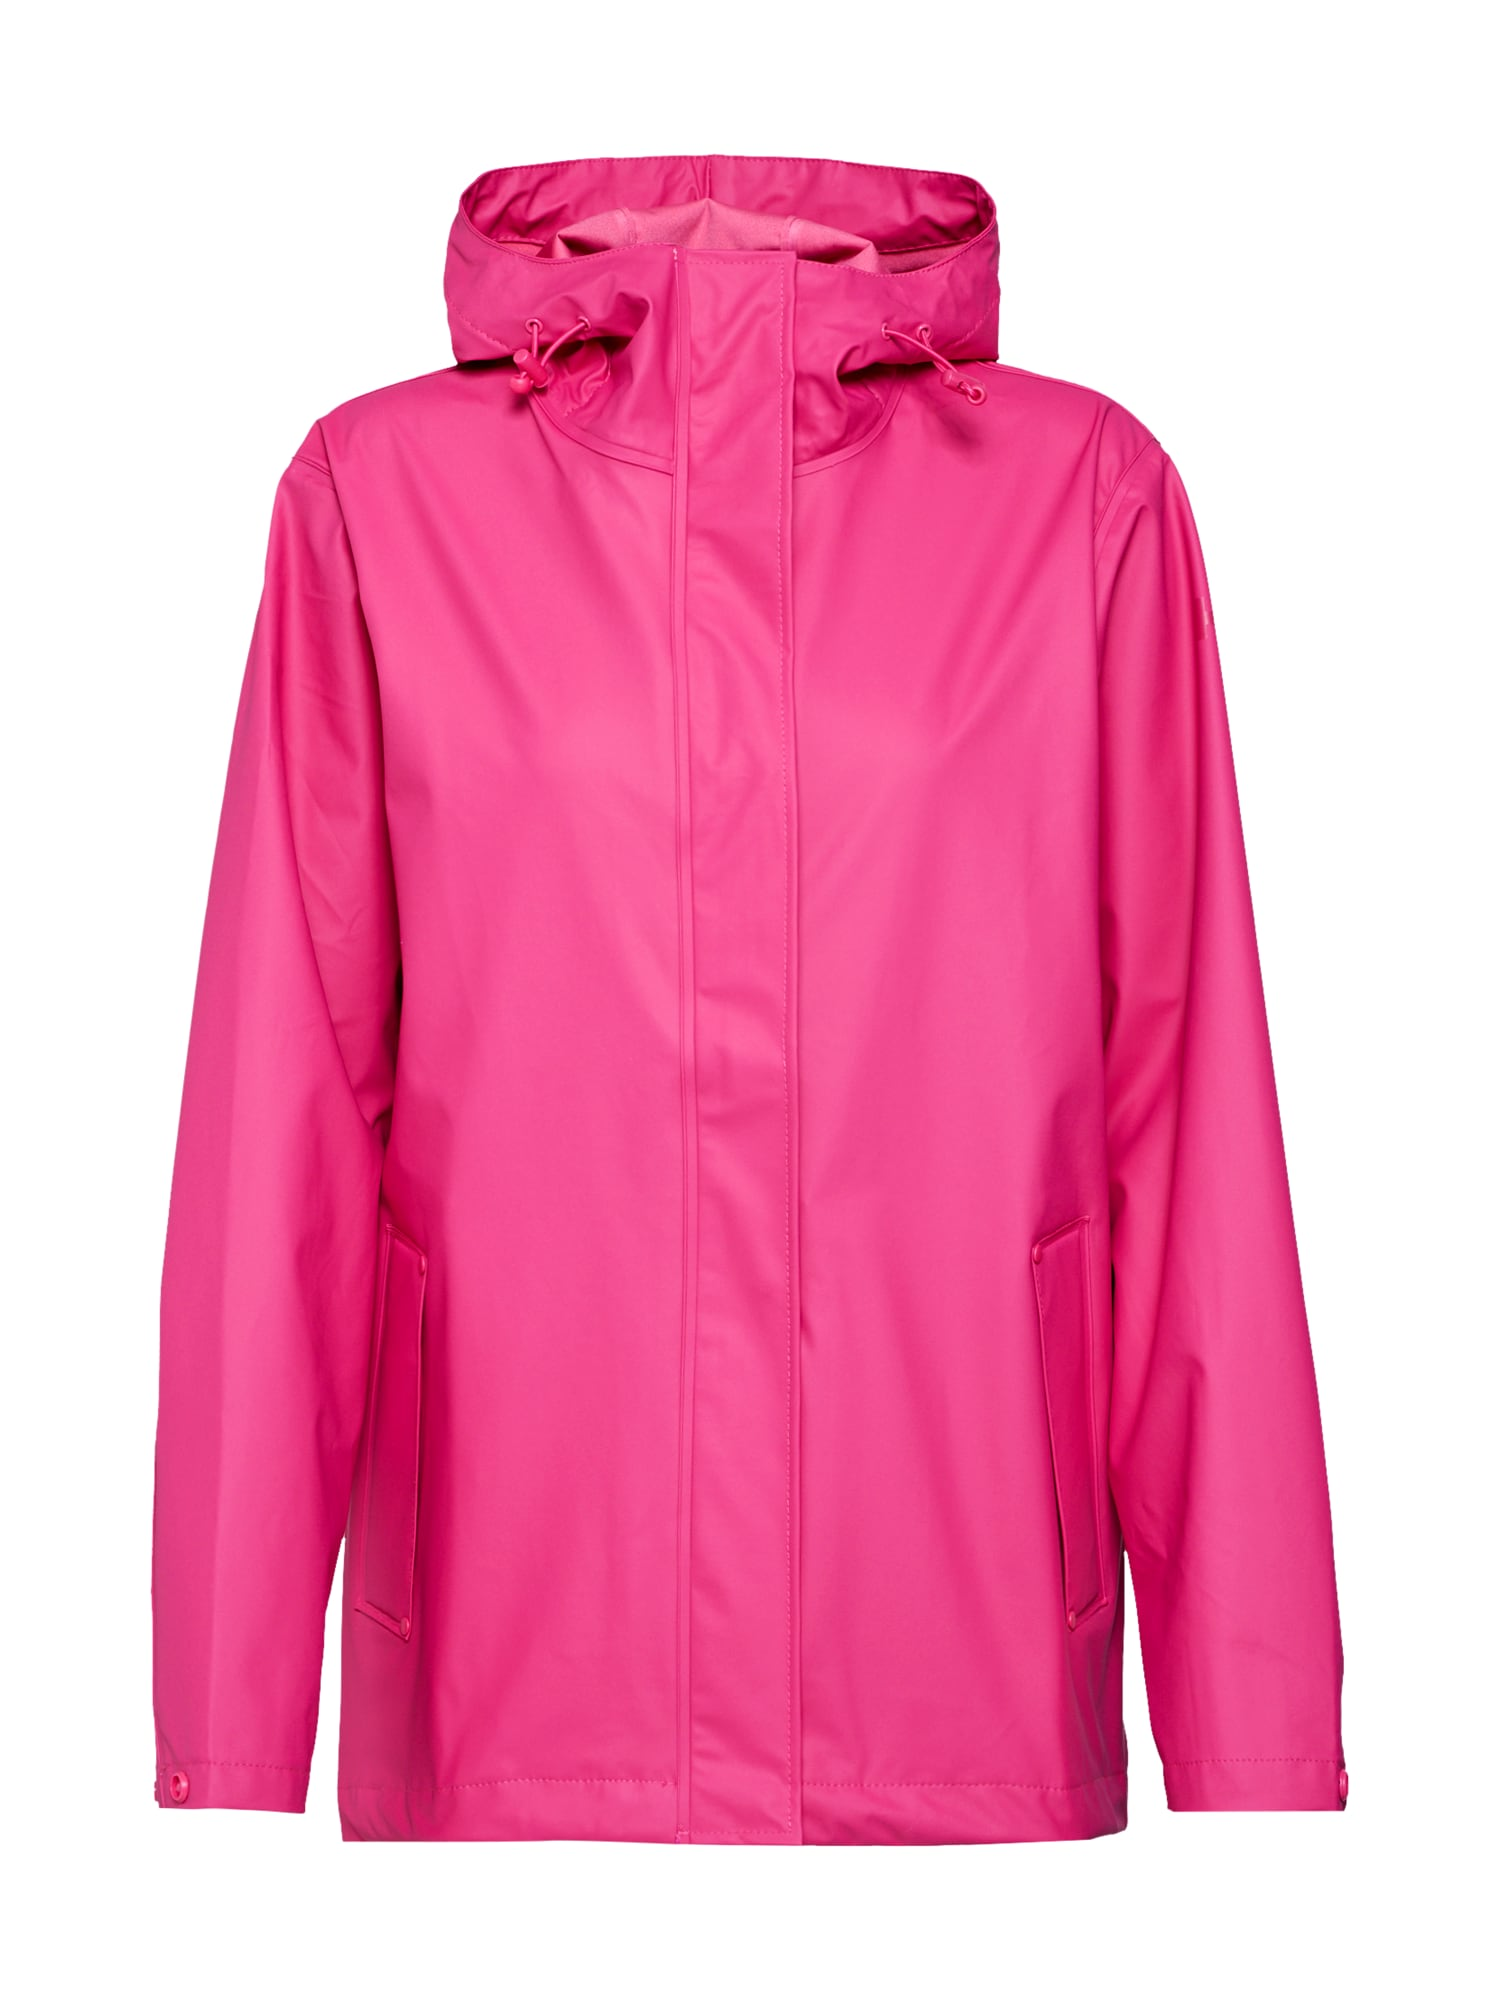 Přechodná bunda W Moss pink HELLY HANSEN